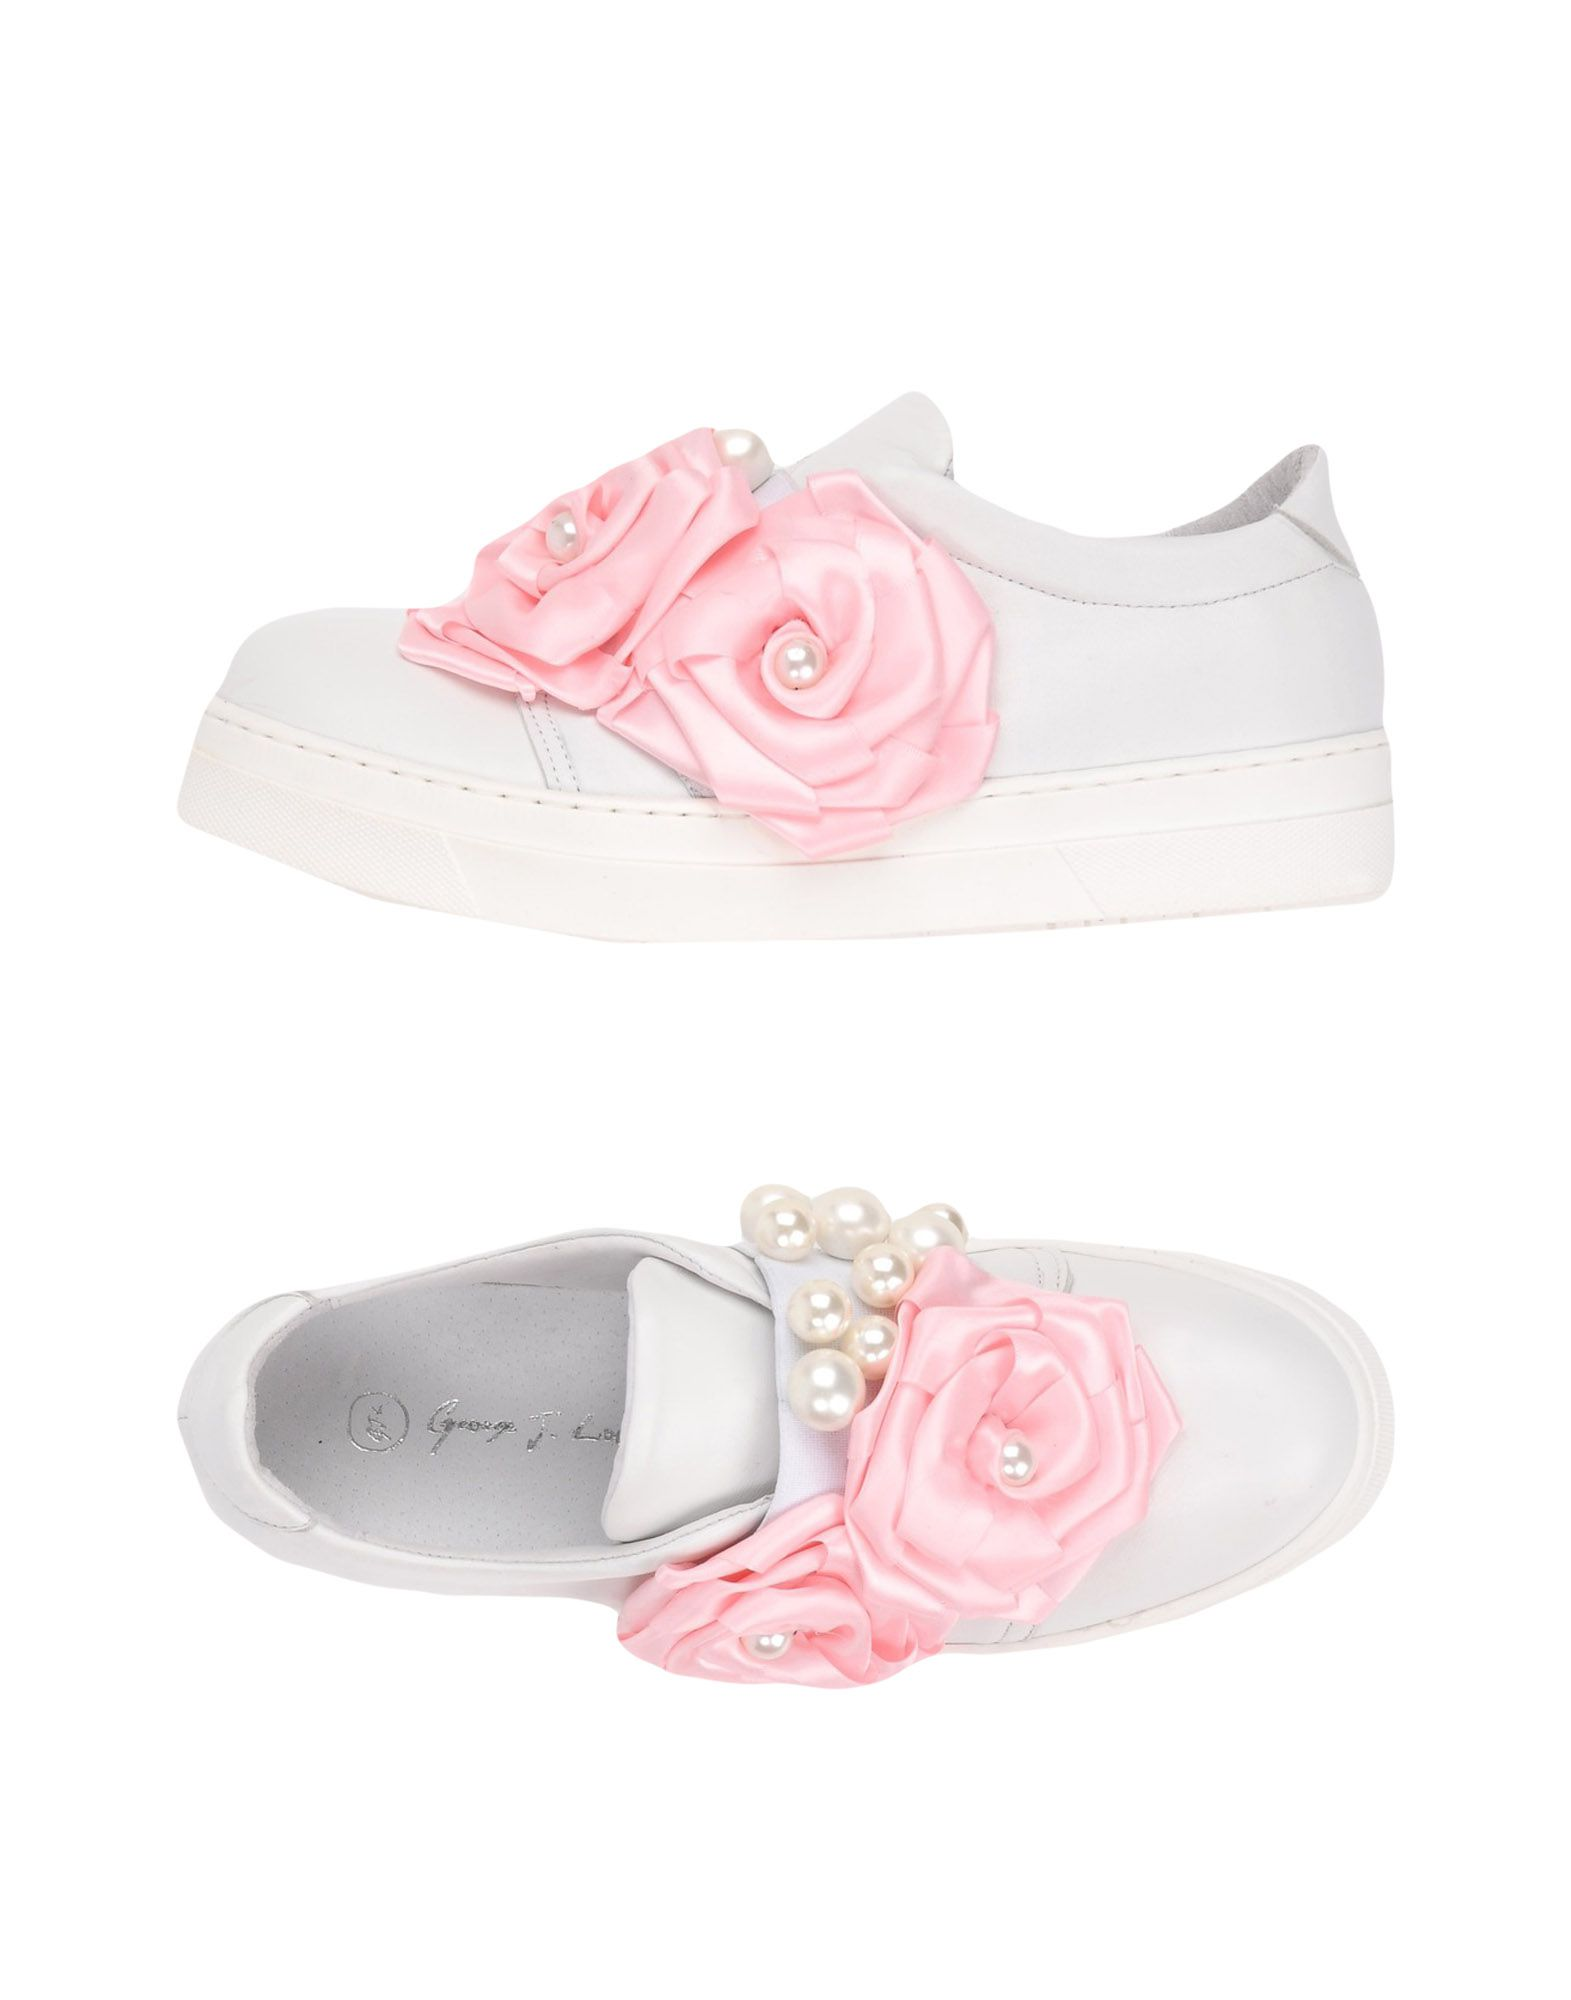 George J. Love Sneakers Damen  11444388KI